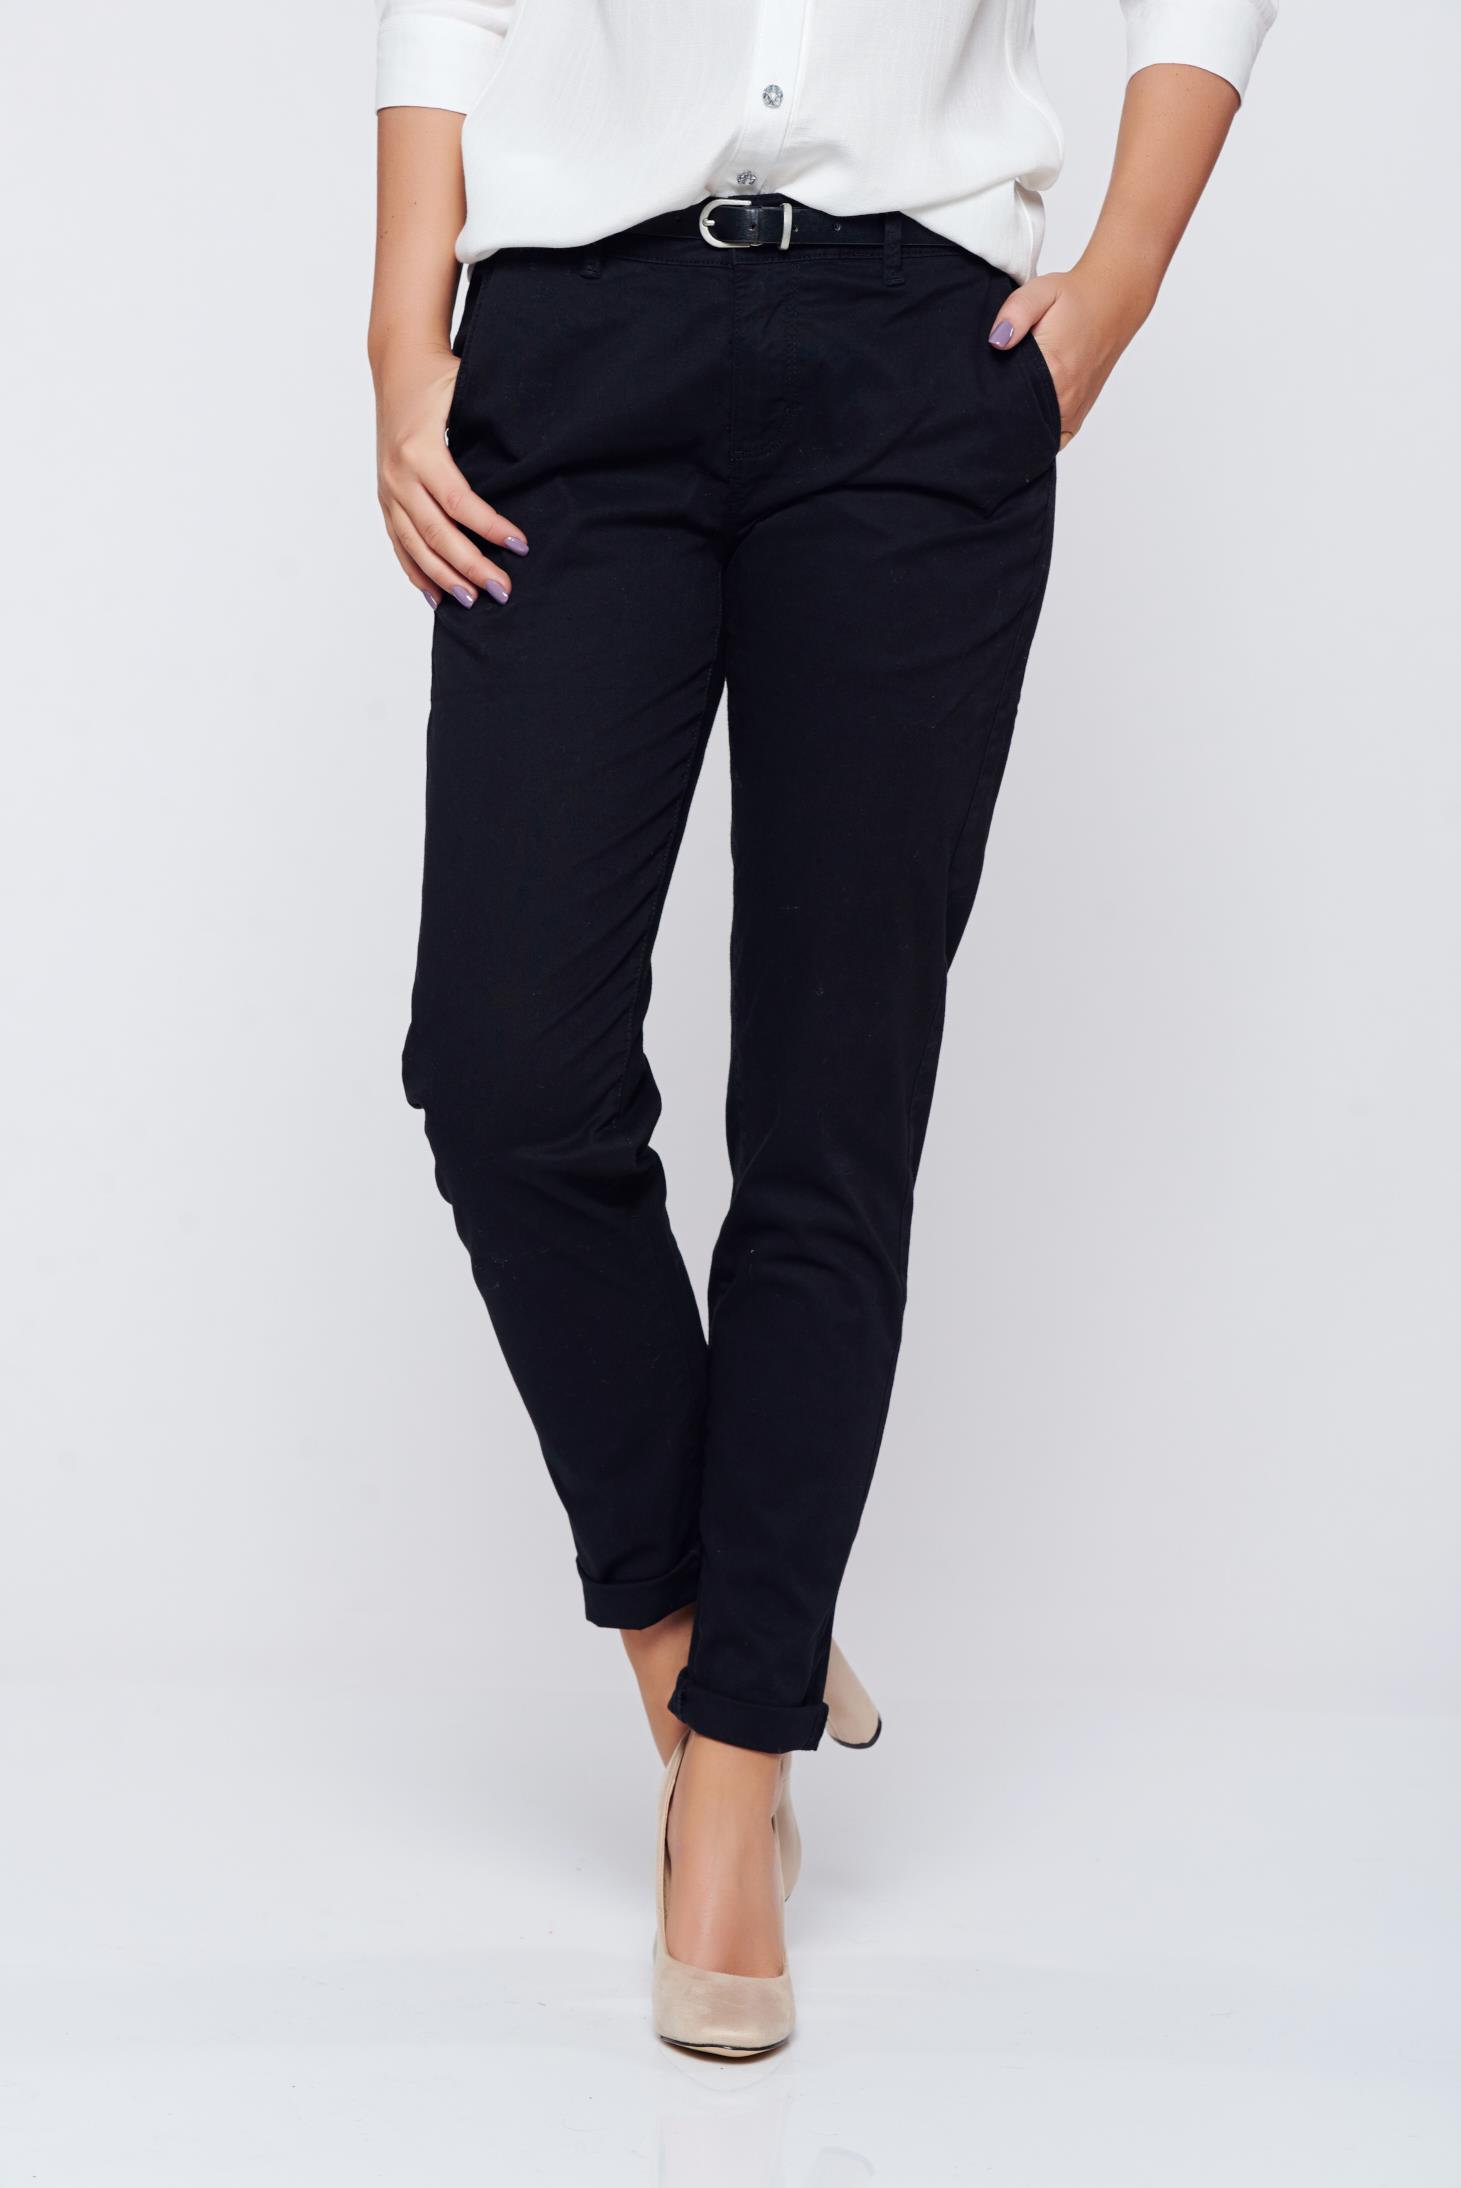 Pantaloni Top Secret negri office din bumbac cu talie medie cu buzunare